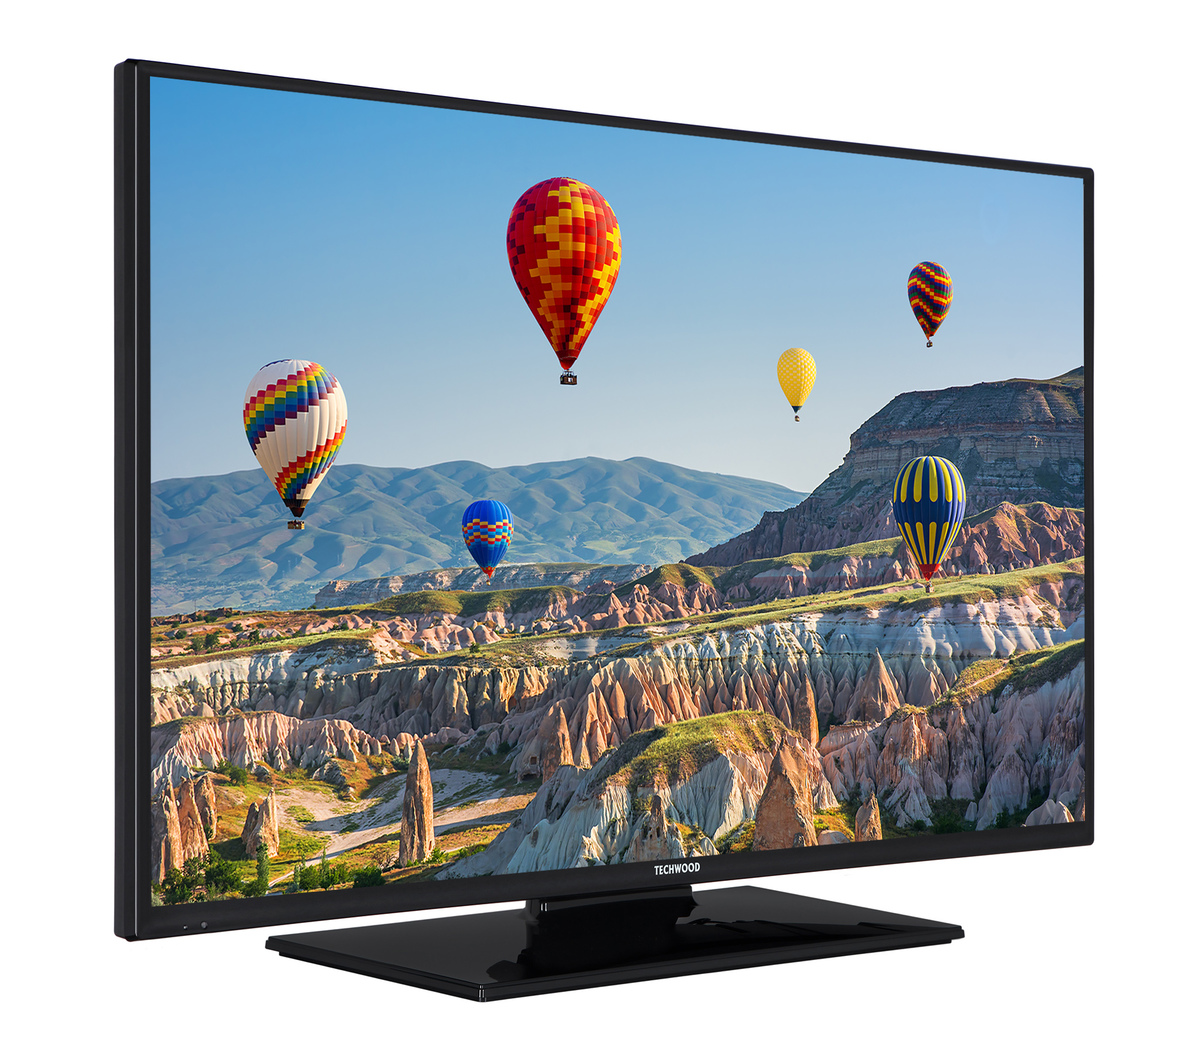 "Bild 3 von Techwood LED TV 40"" (102 cm)"